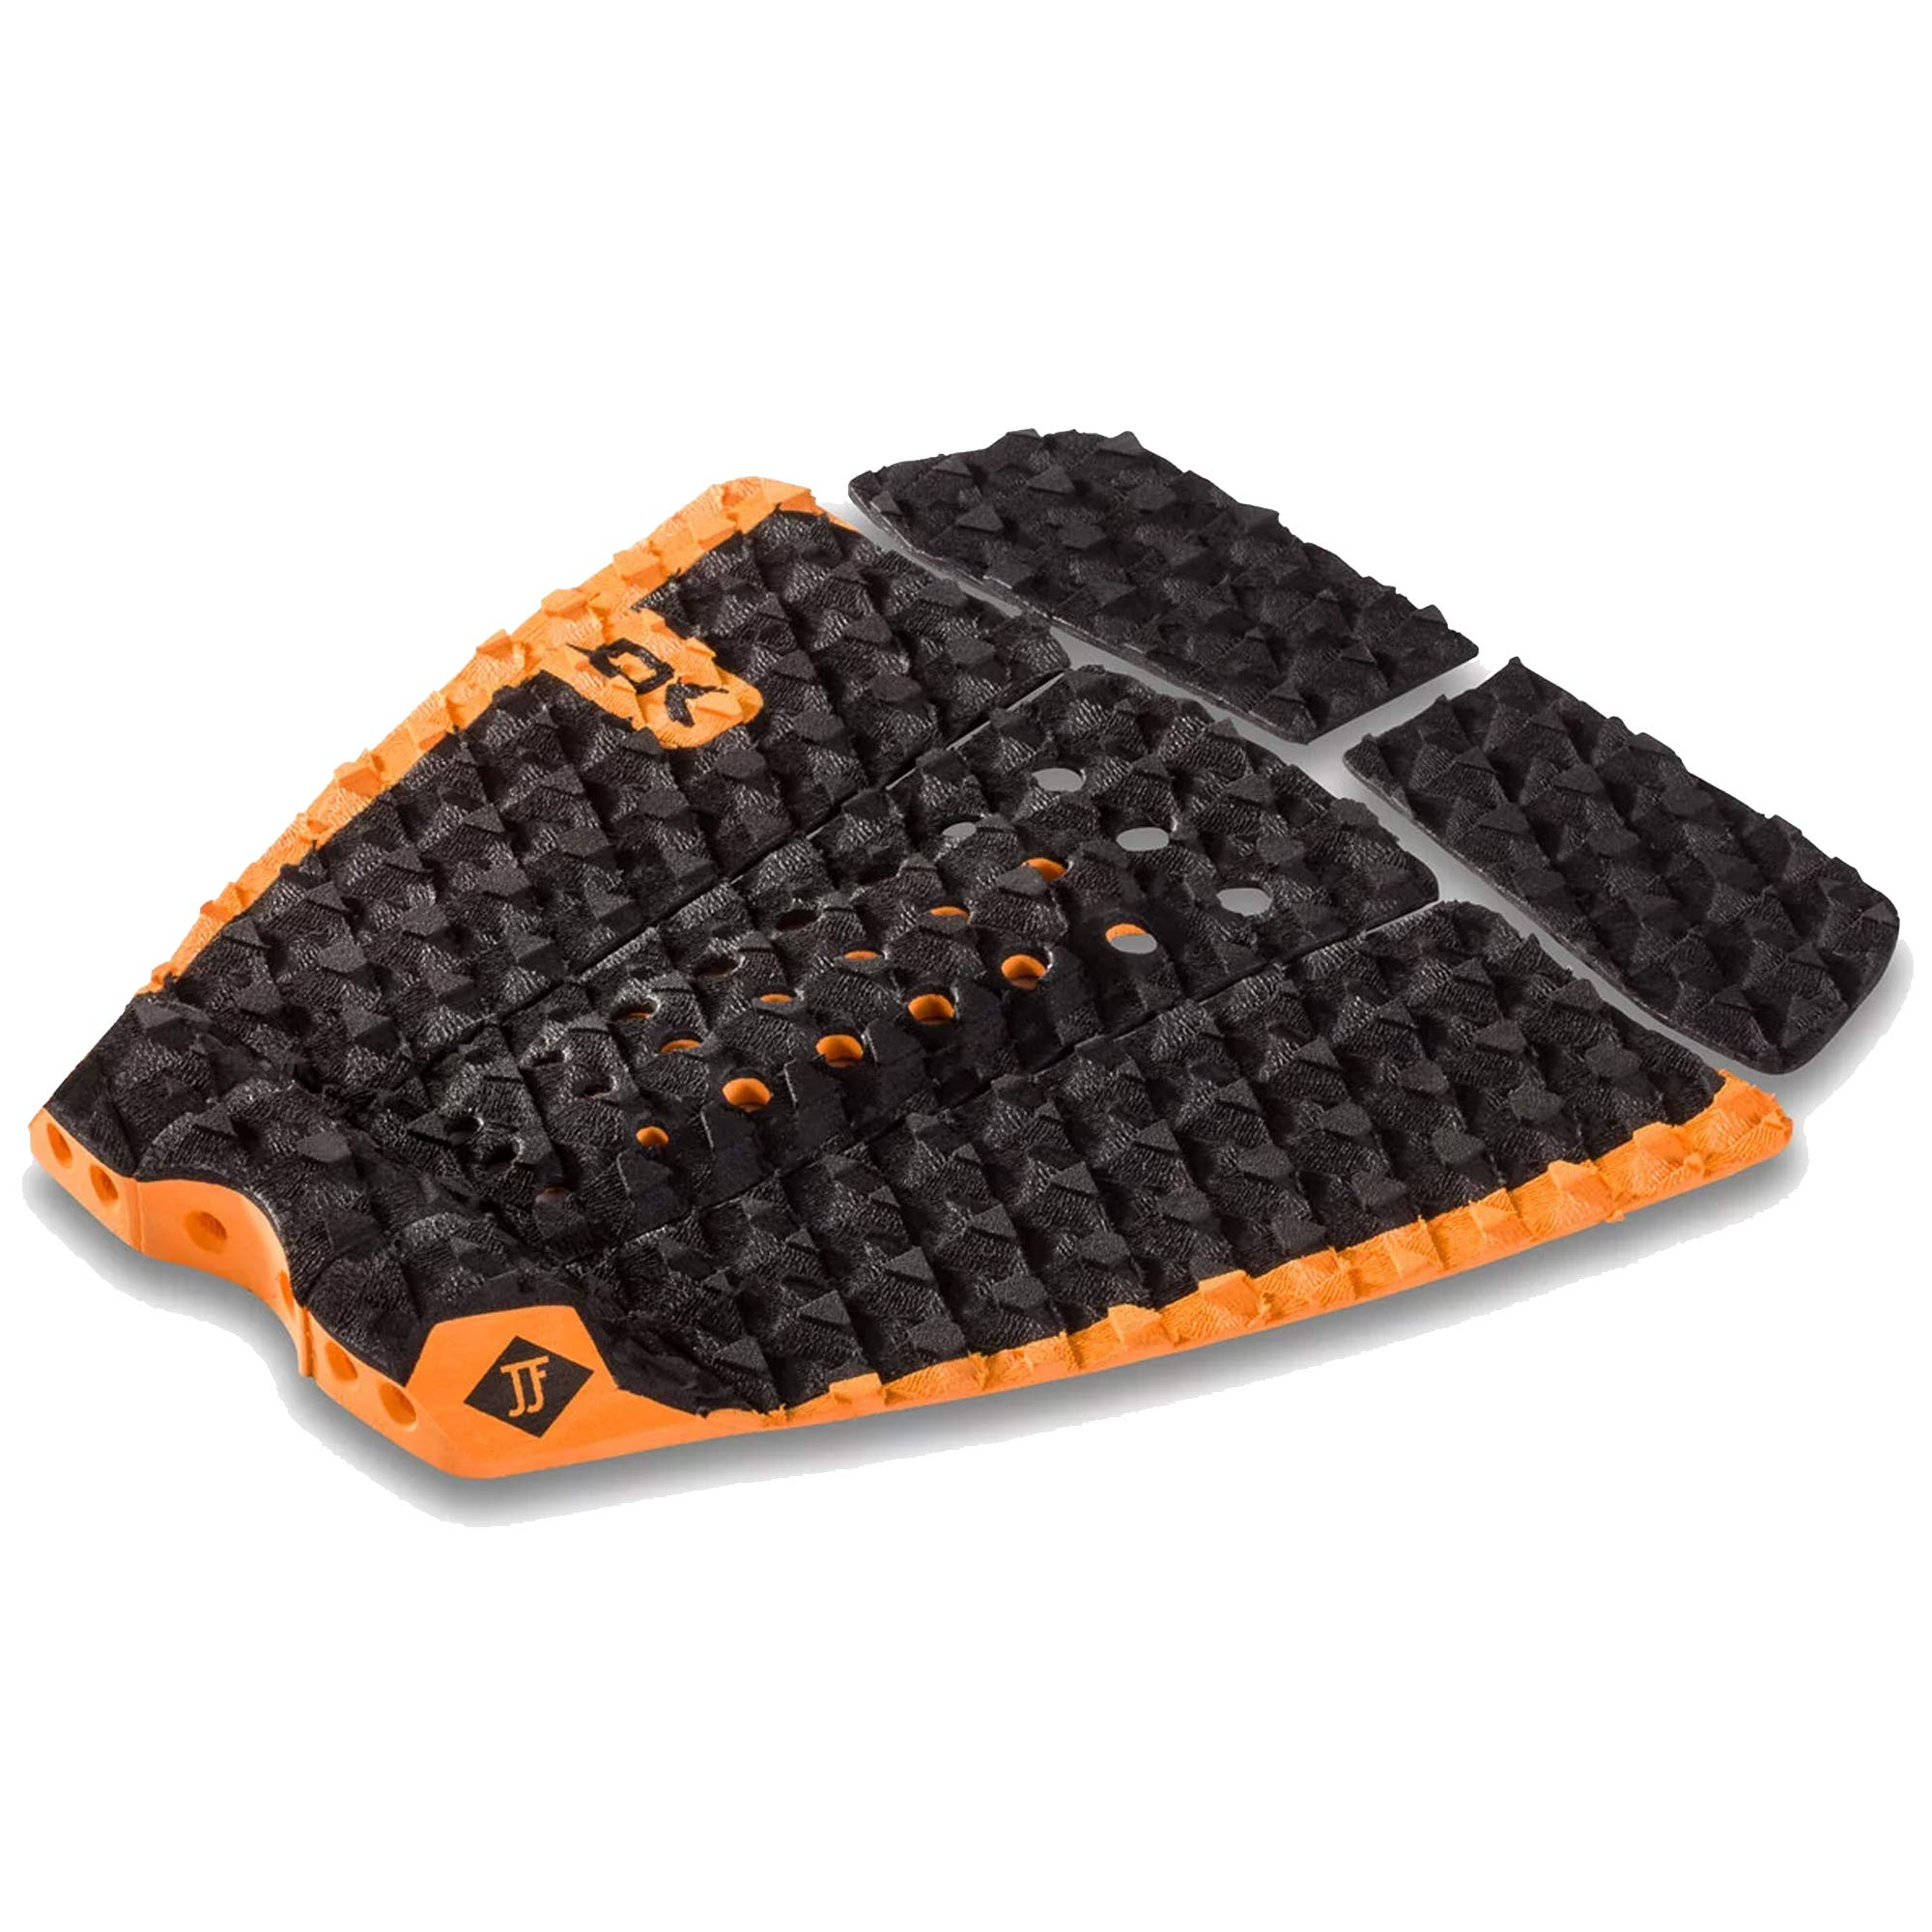 Dakine John John Florence Pro Surf Traction Pad, Black/Orange, One Size by Dakine